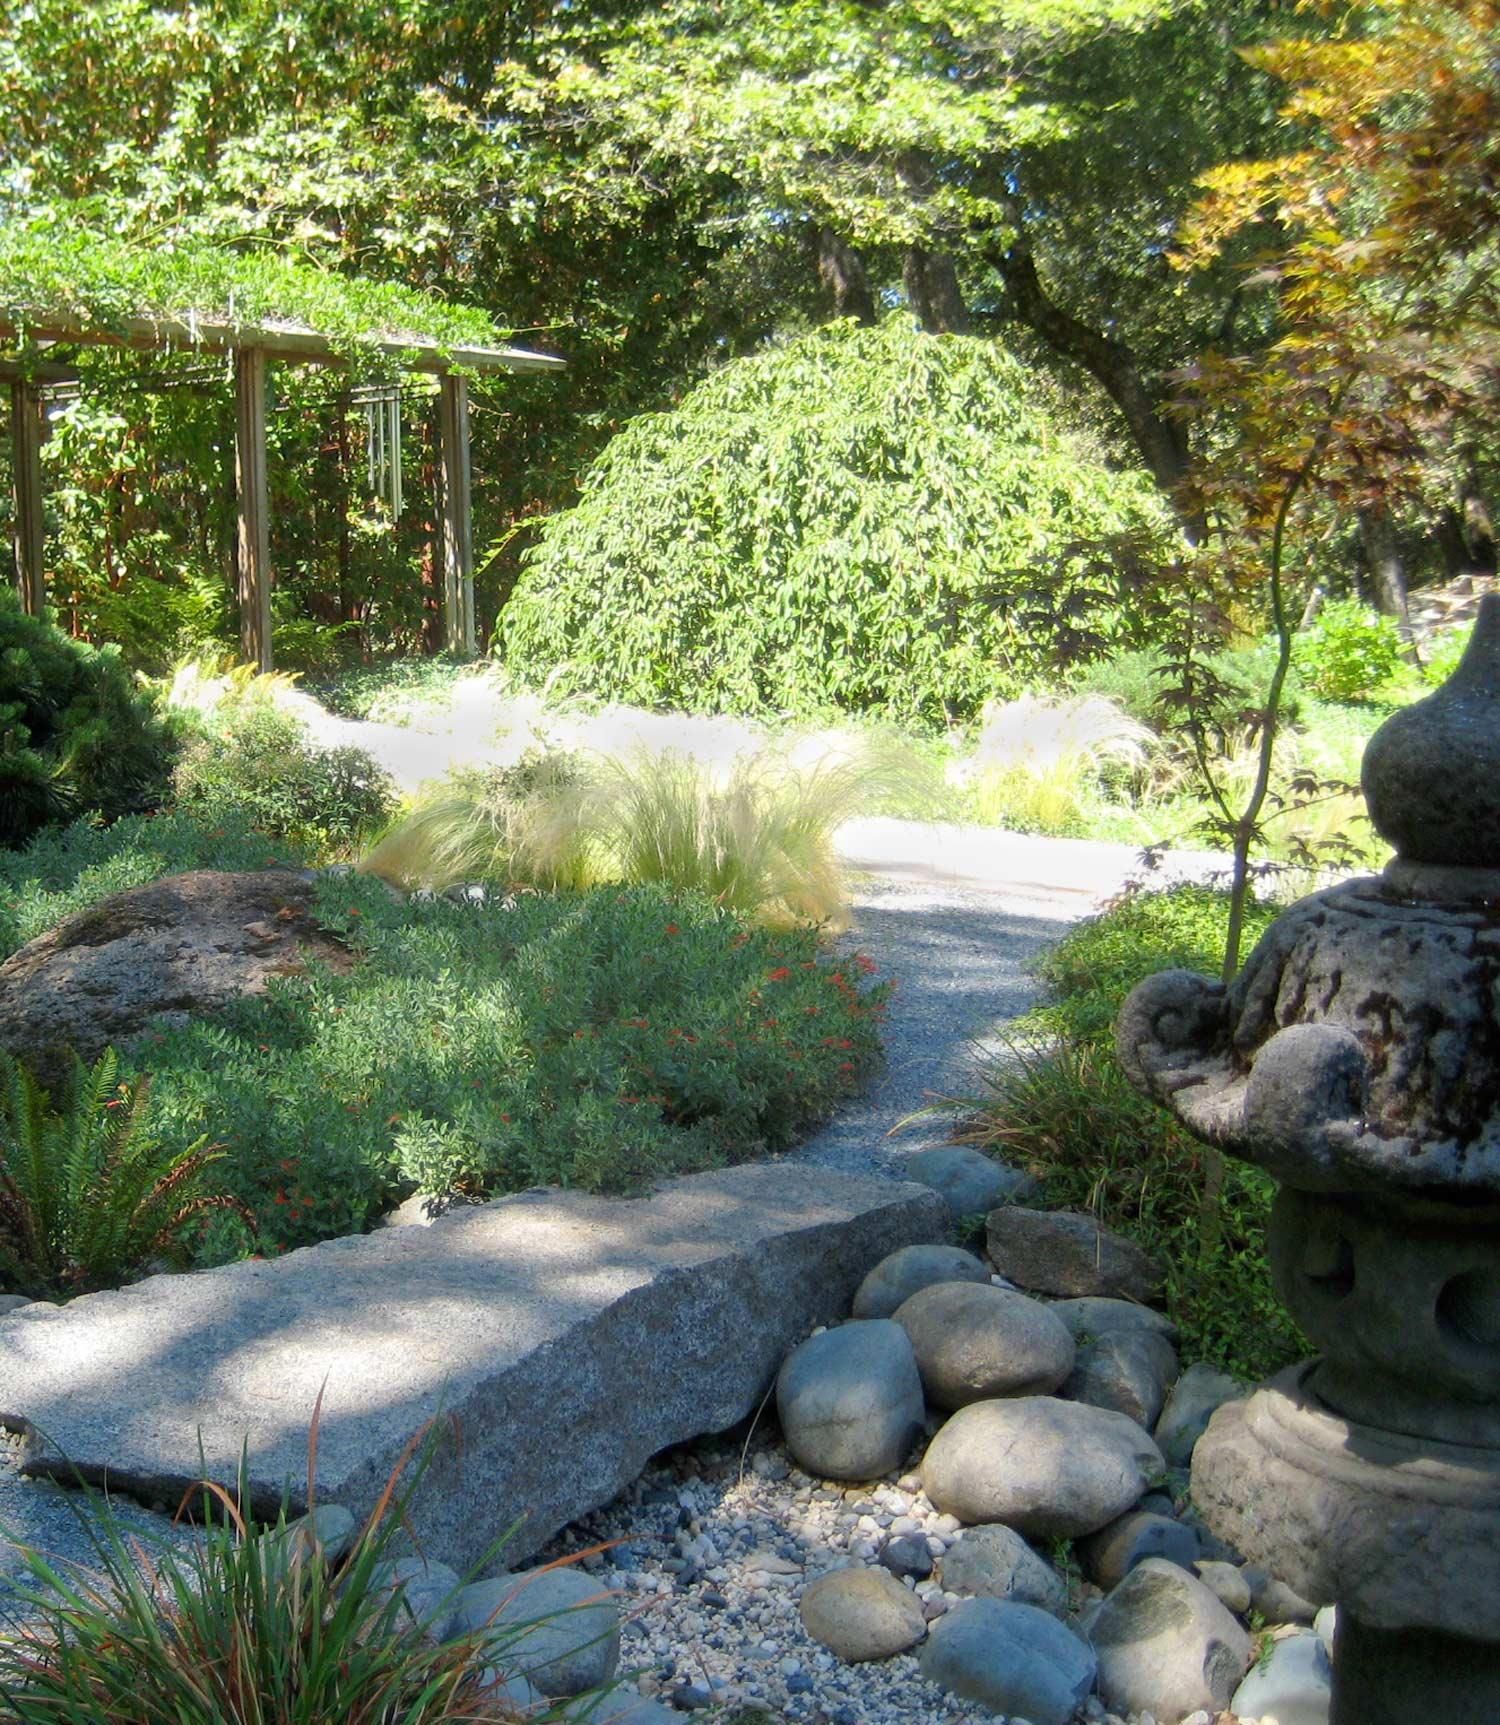 Stone bridge in a woodland garden